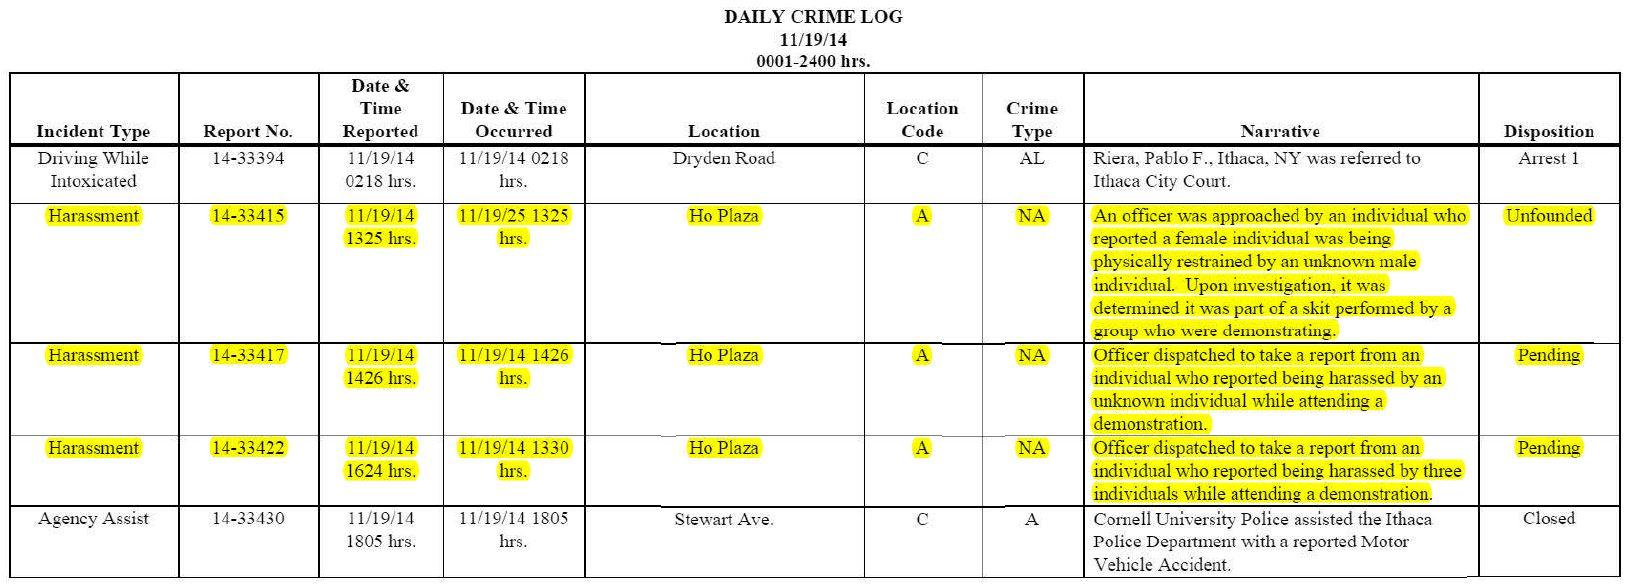 Cornell Police Log 11-19-2014 highlighted